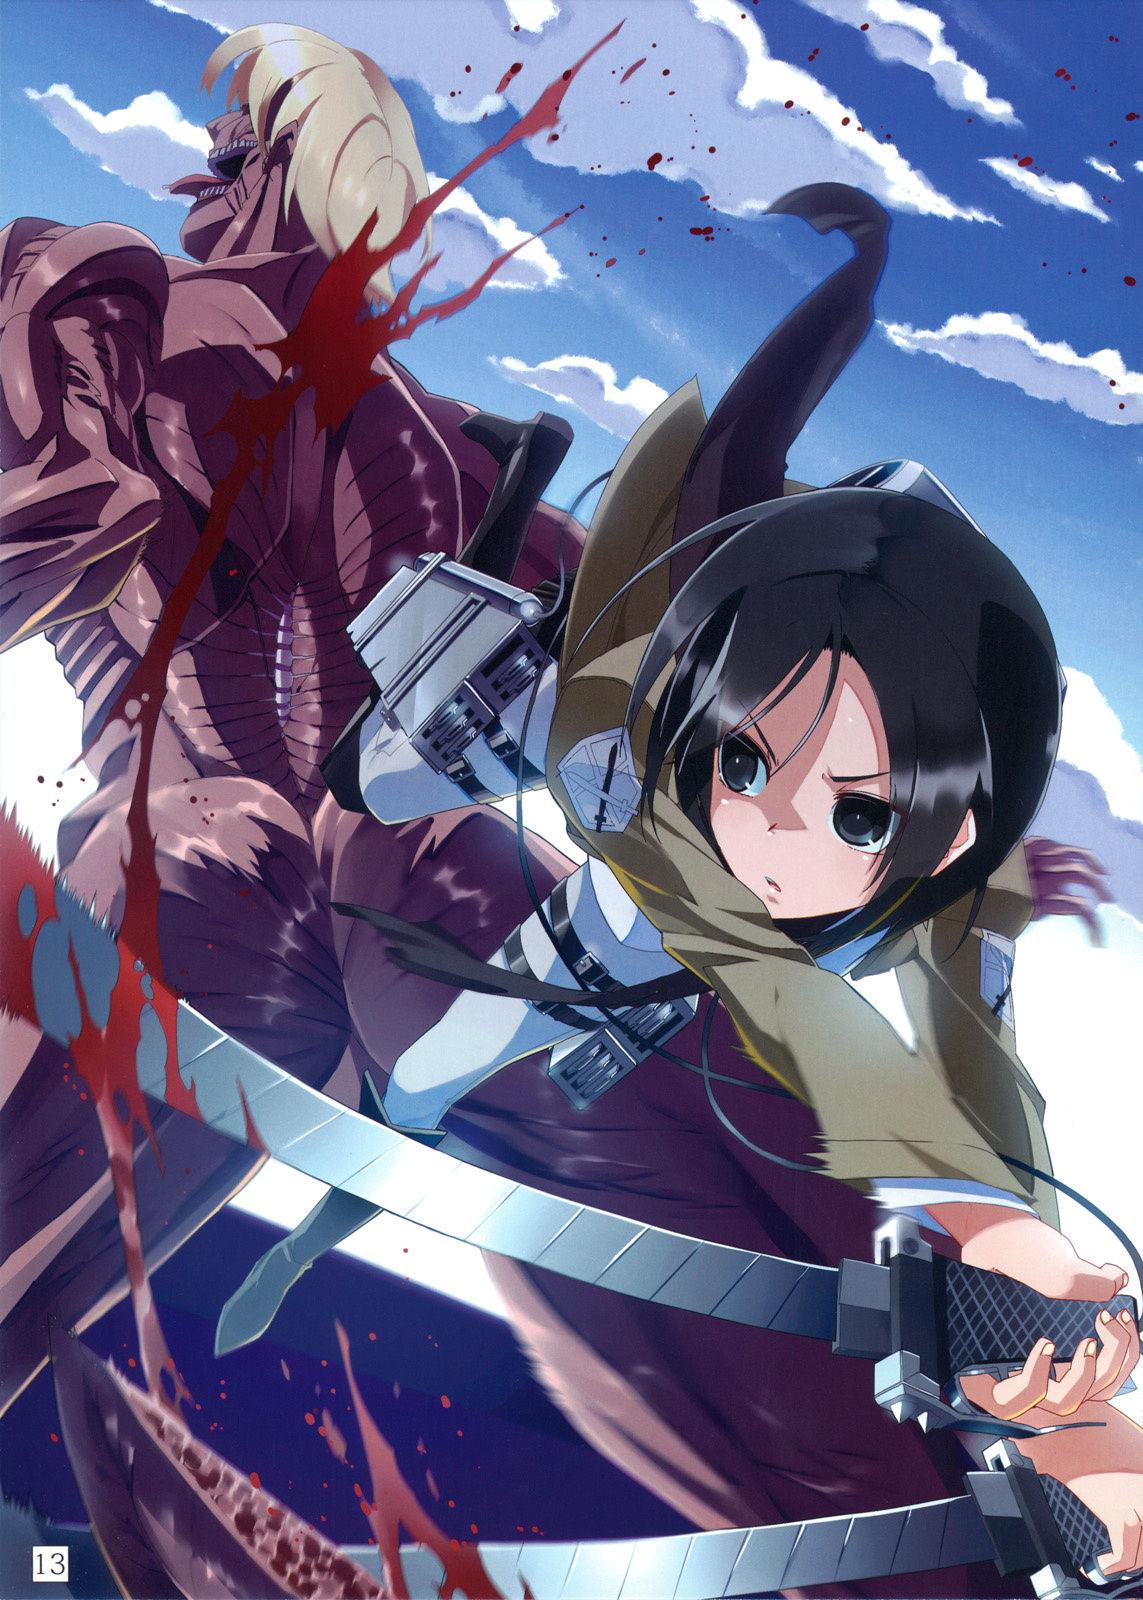 Shinngeki vol 2 hentai manga picture 11